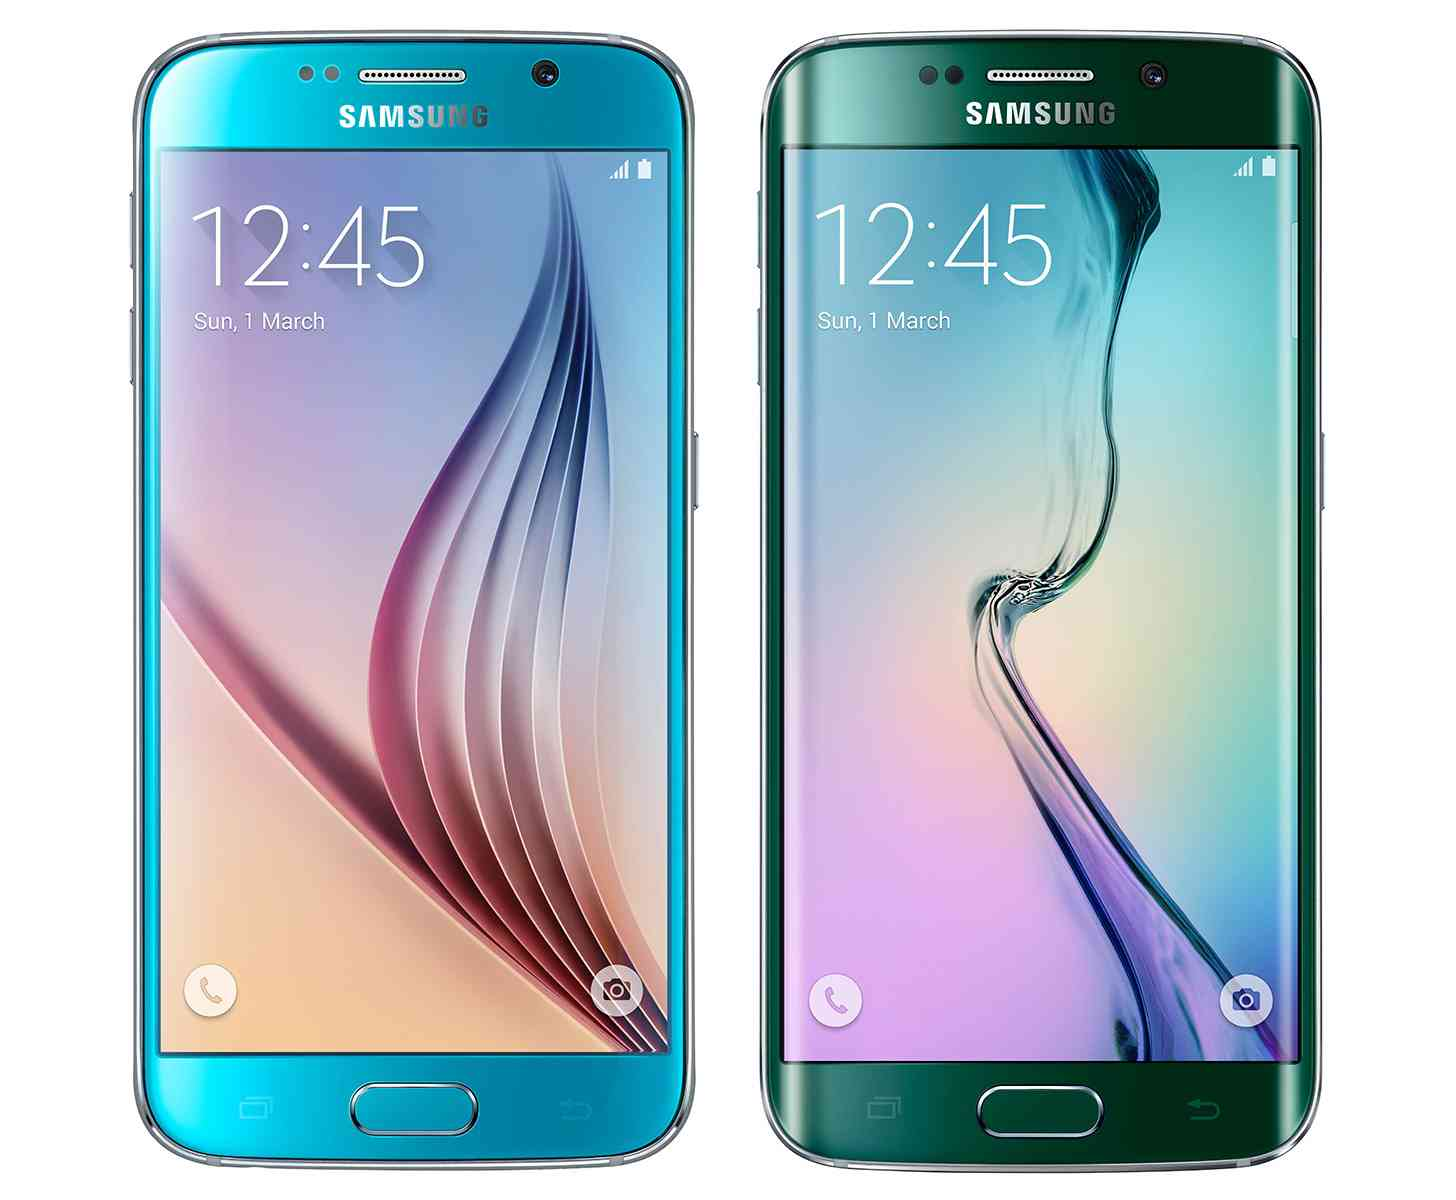 Blue Topaz Samsung Galaxy S6, Green Emerald Samsung Galaxy S6 edge front